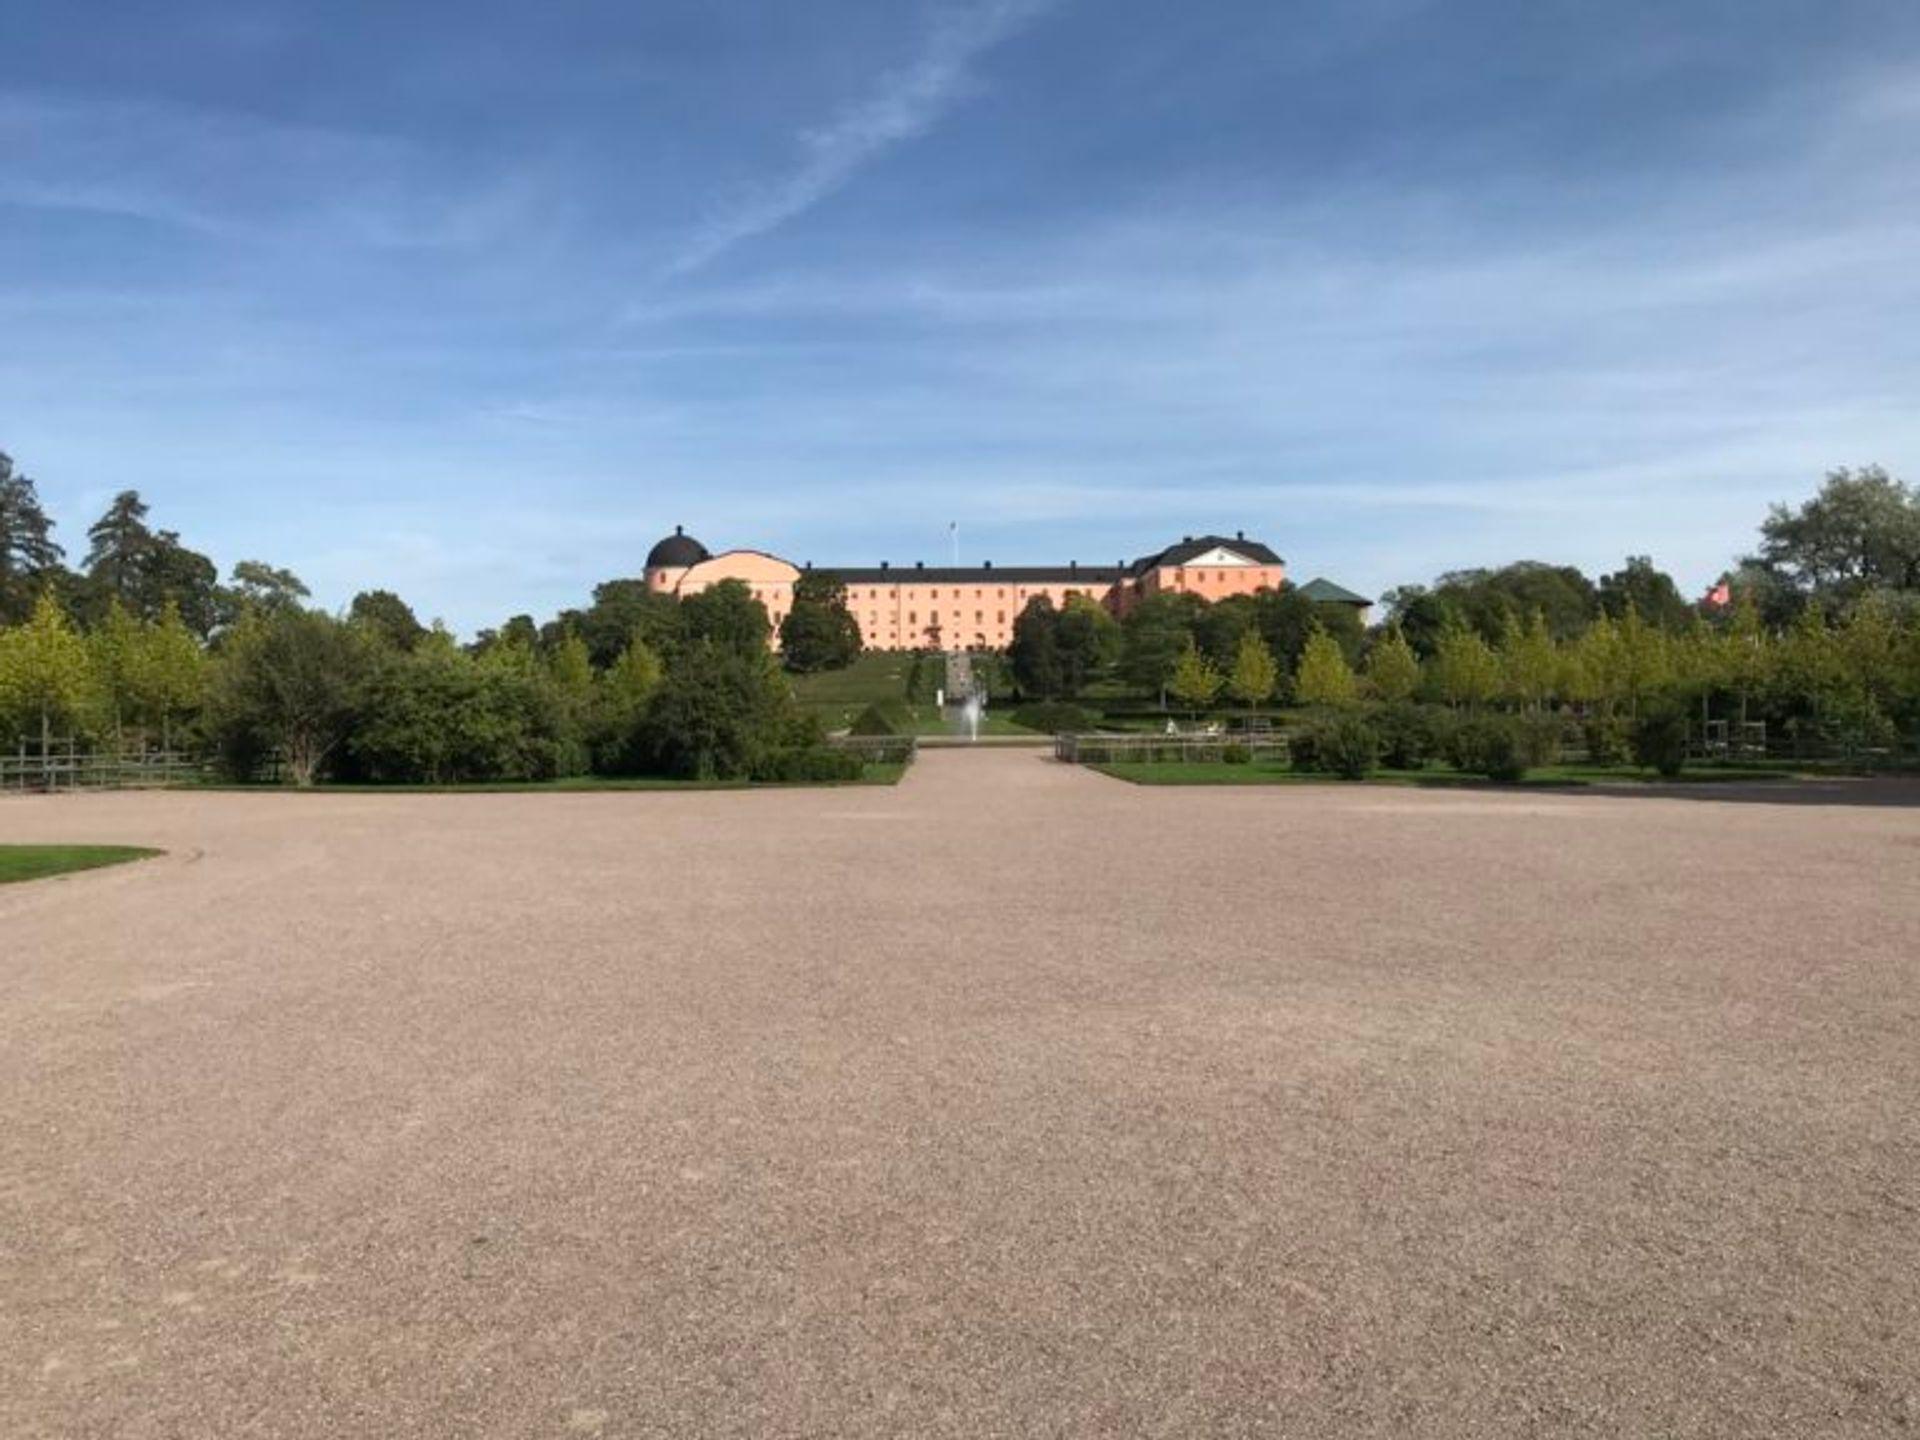 Botantical gardens in front of a large, pink castle.